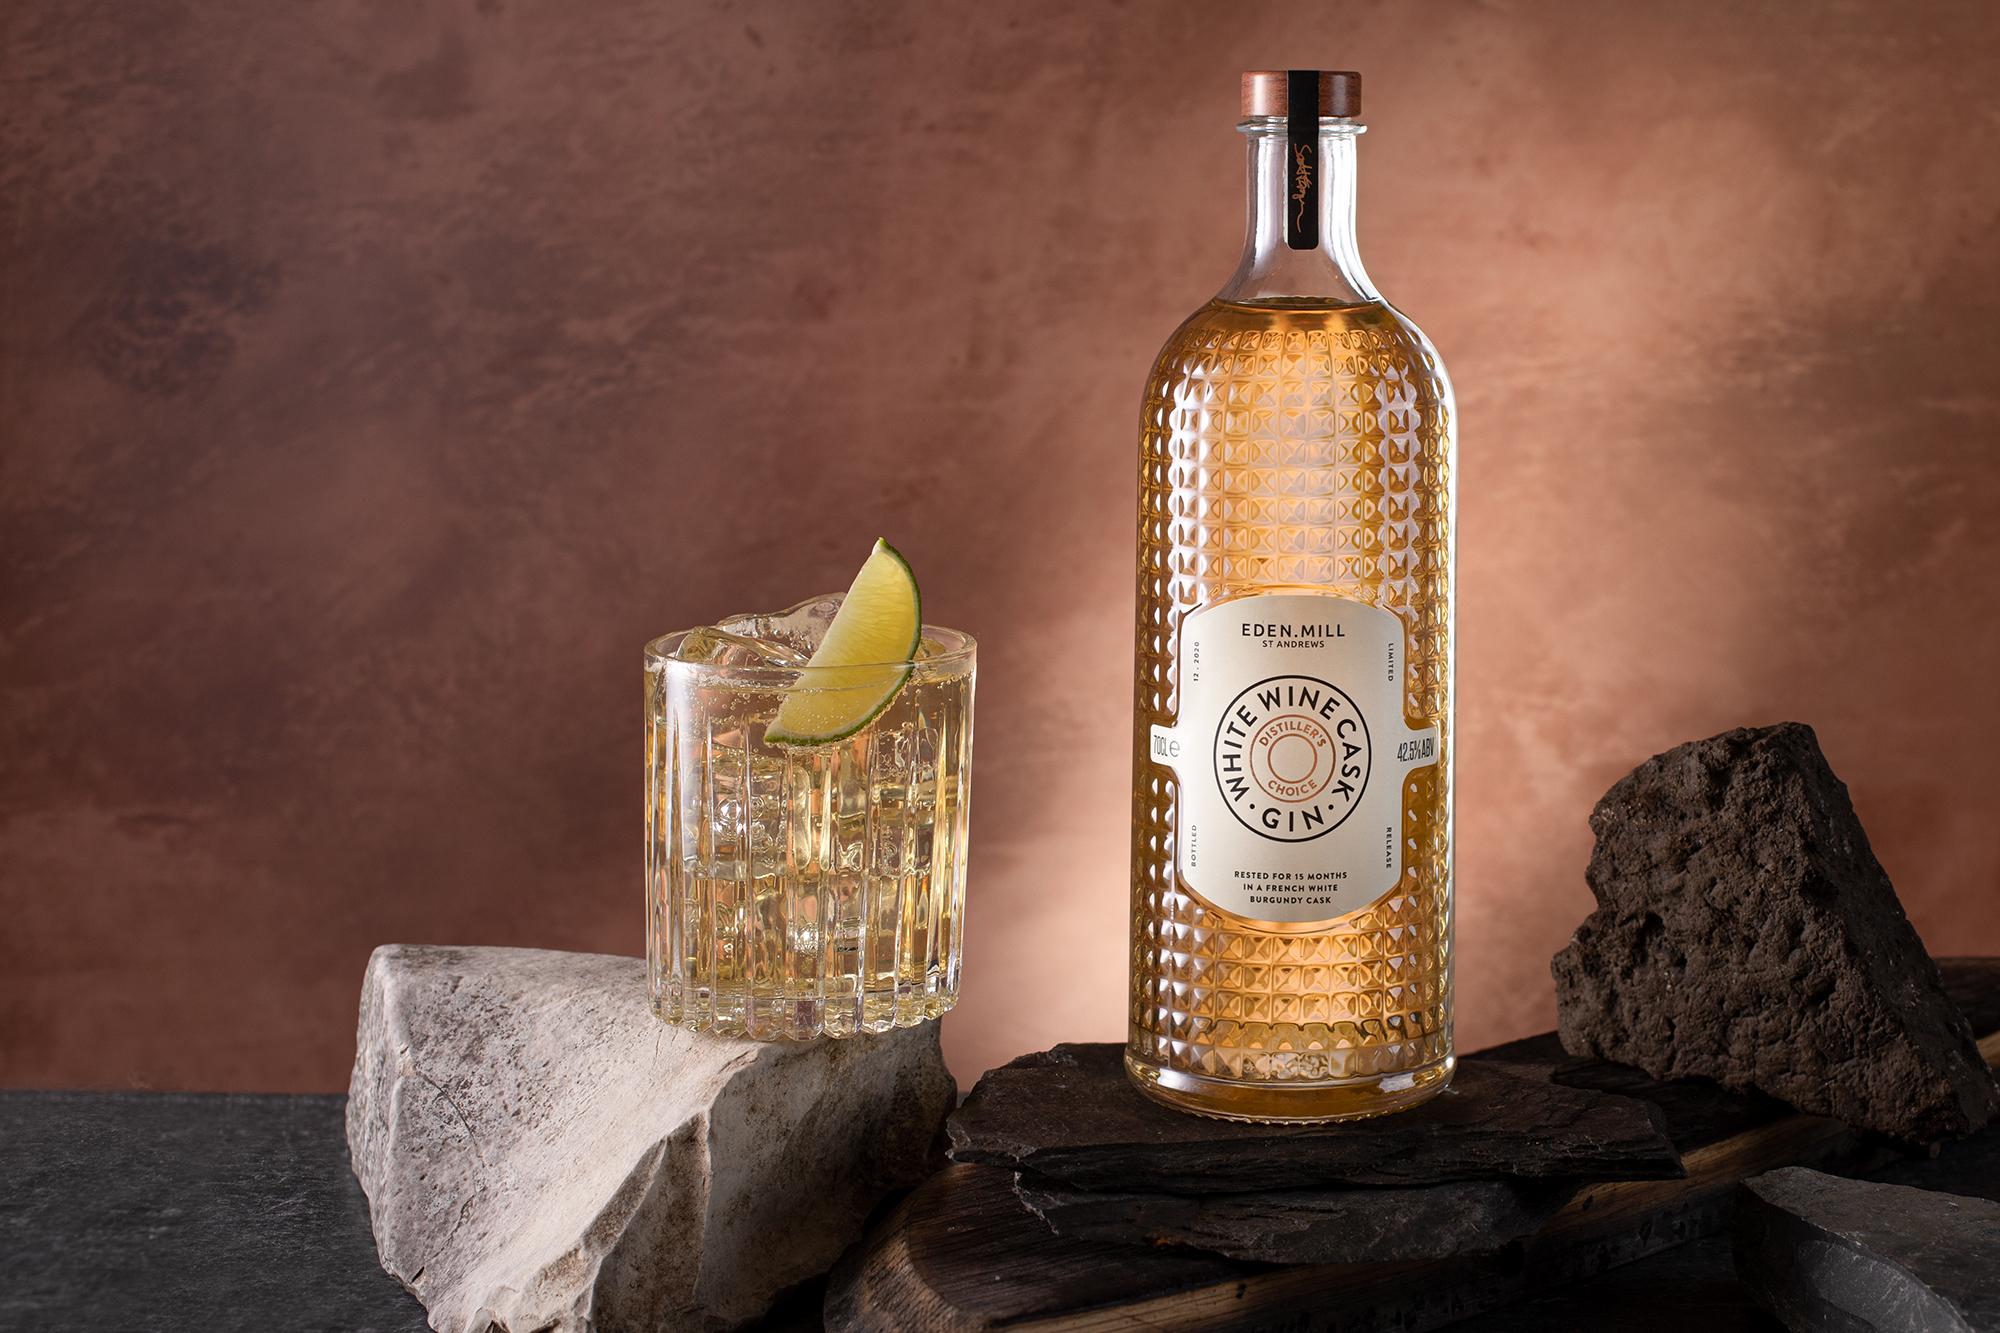 Eden Mill Distiller's Choice White Wine Cask-Aged Gin perfect serve